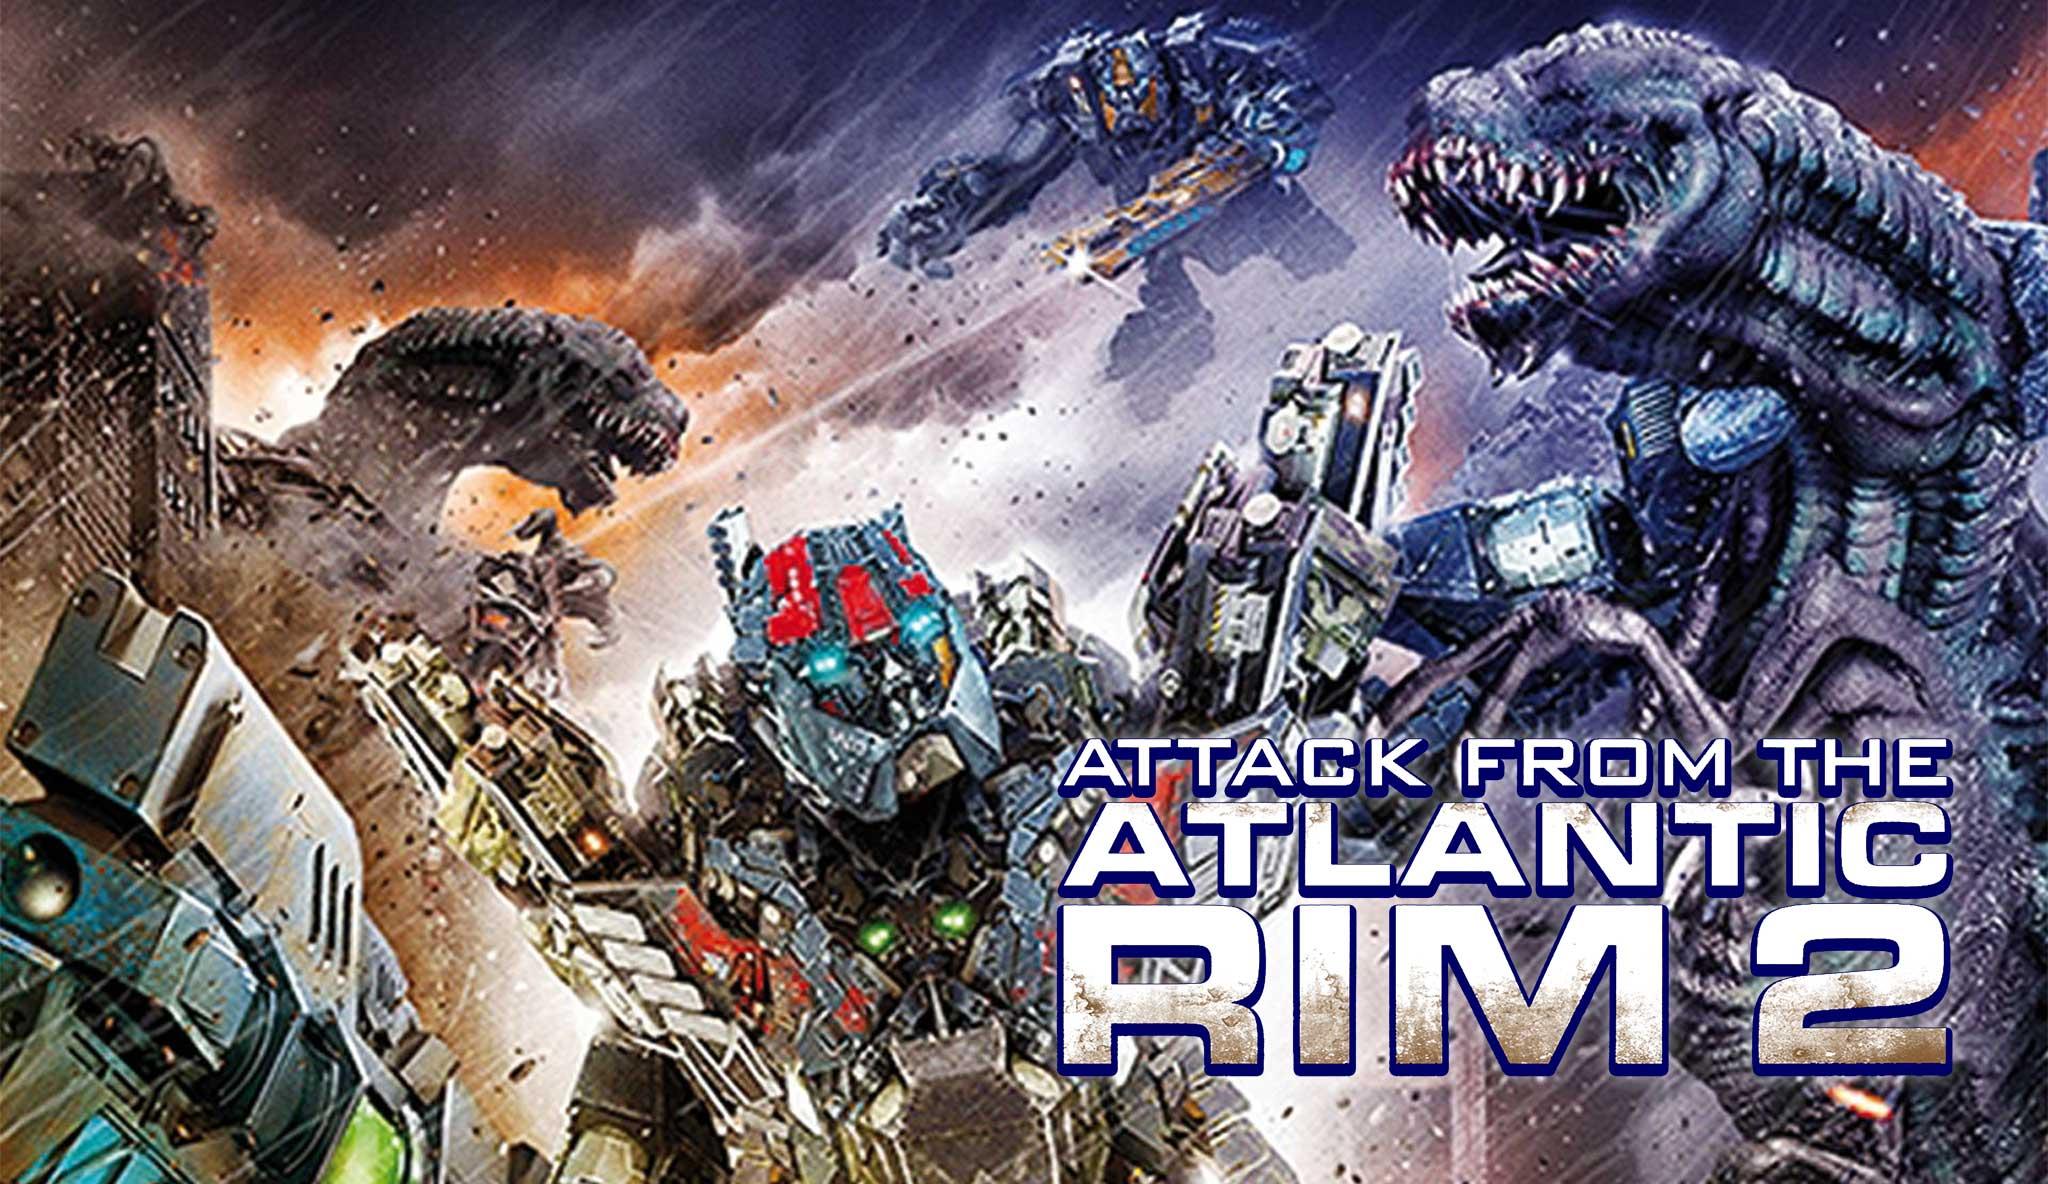 attack-from-the-atlantic-rim-2-metal-vs-monster\header.jpg